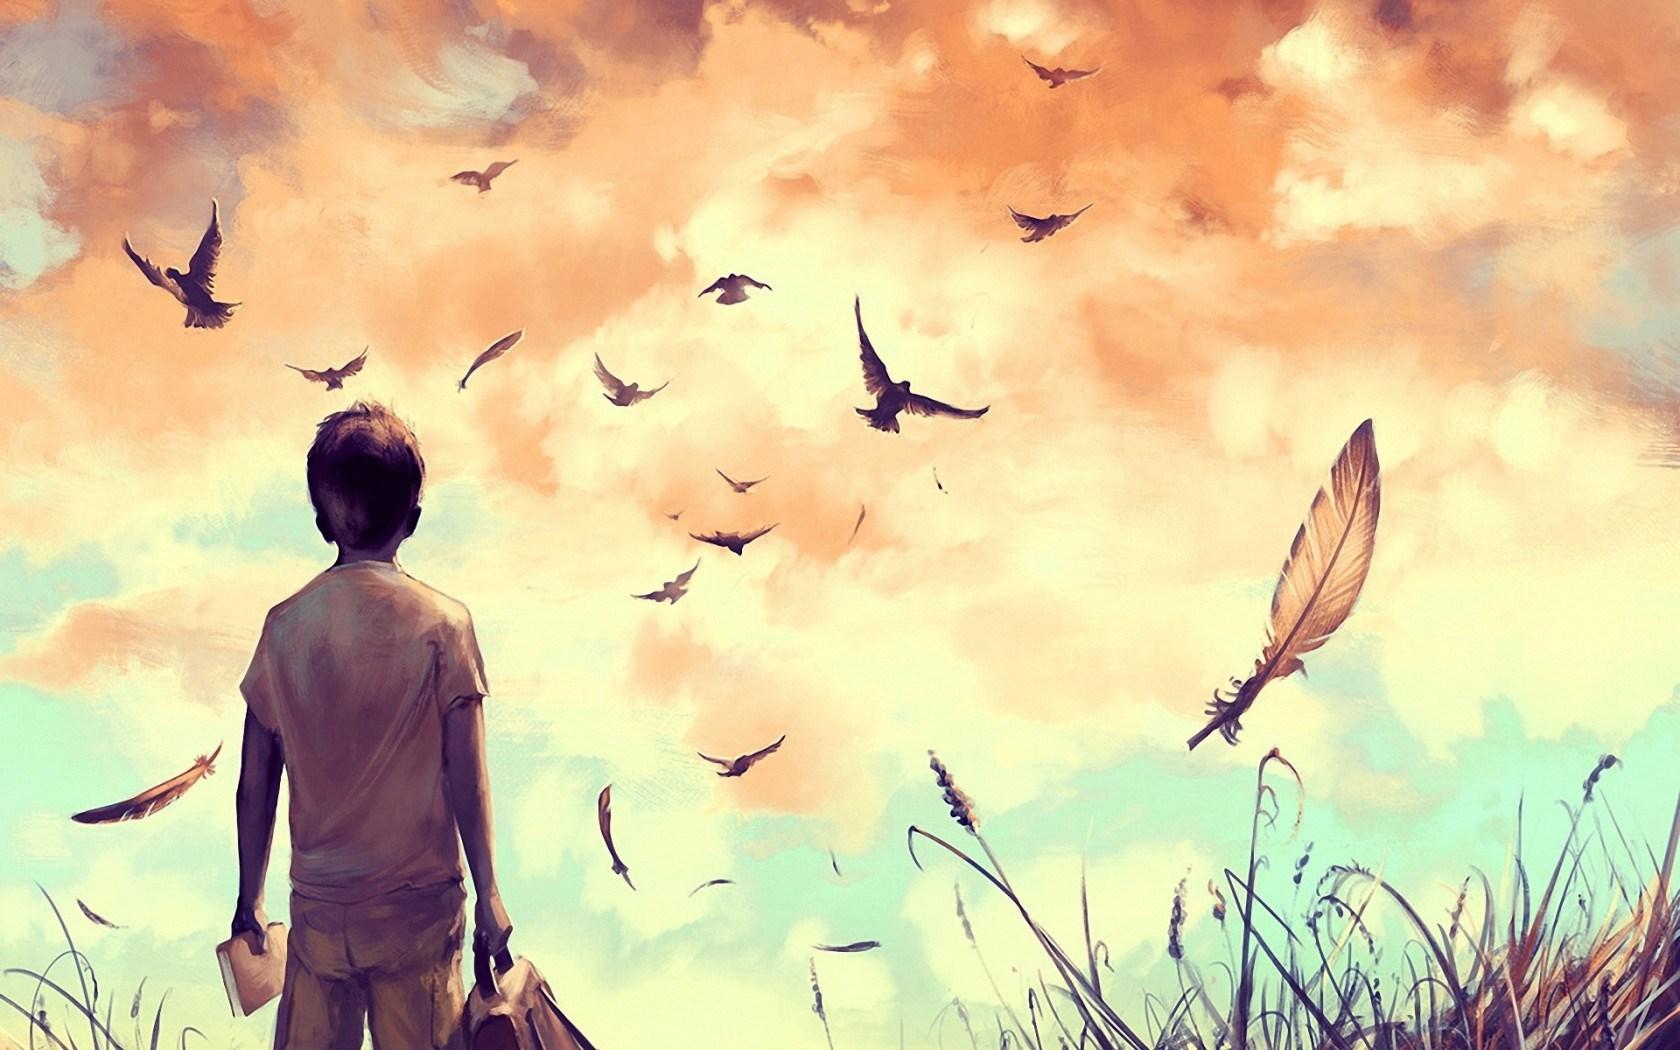 Boy Birds Sky Mood Artwork HD Wallpaper